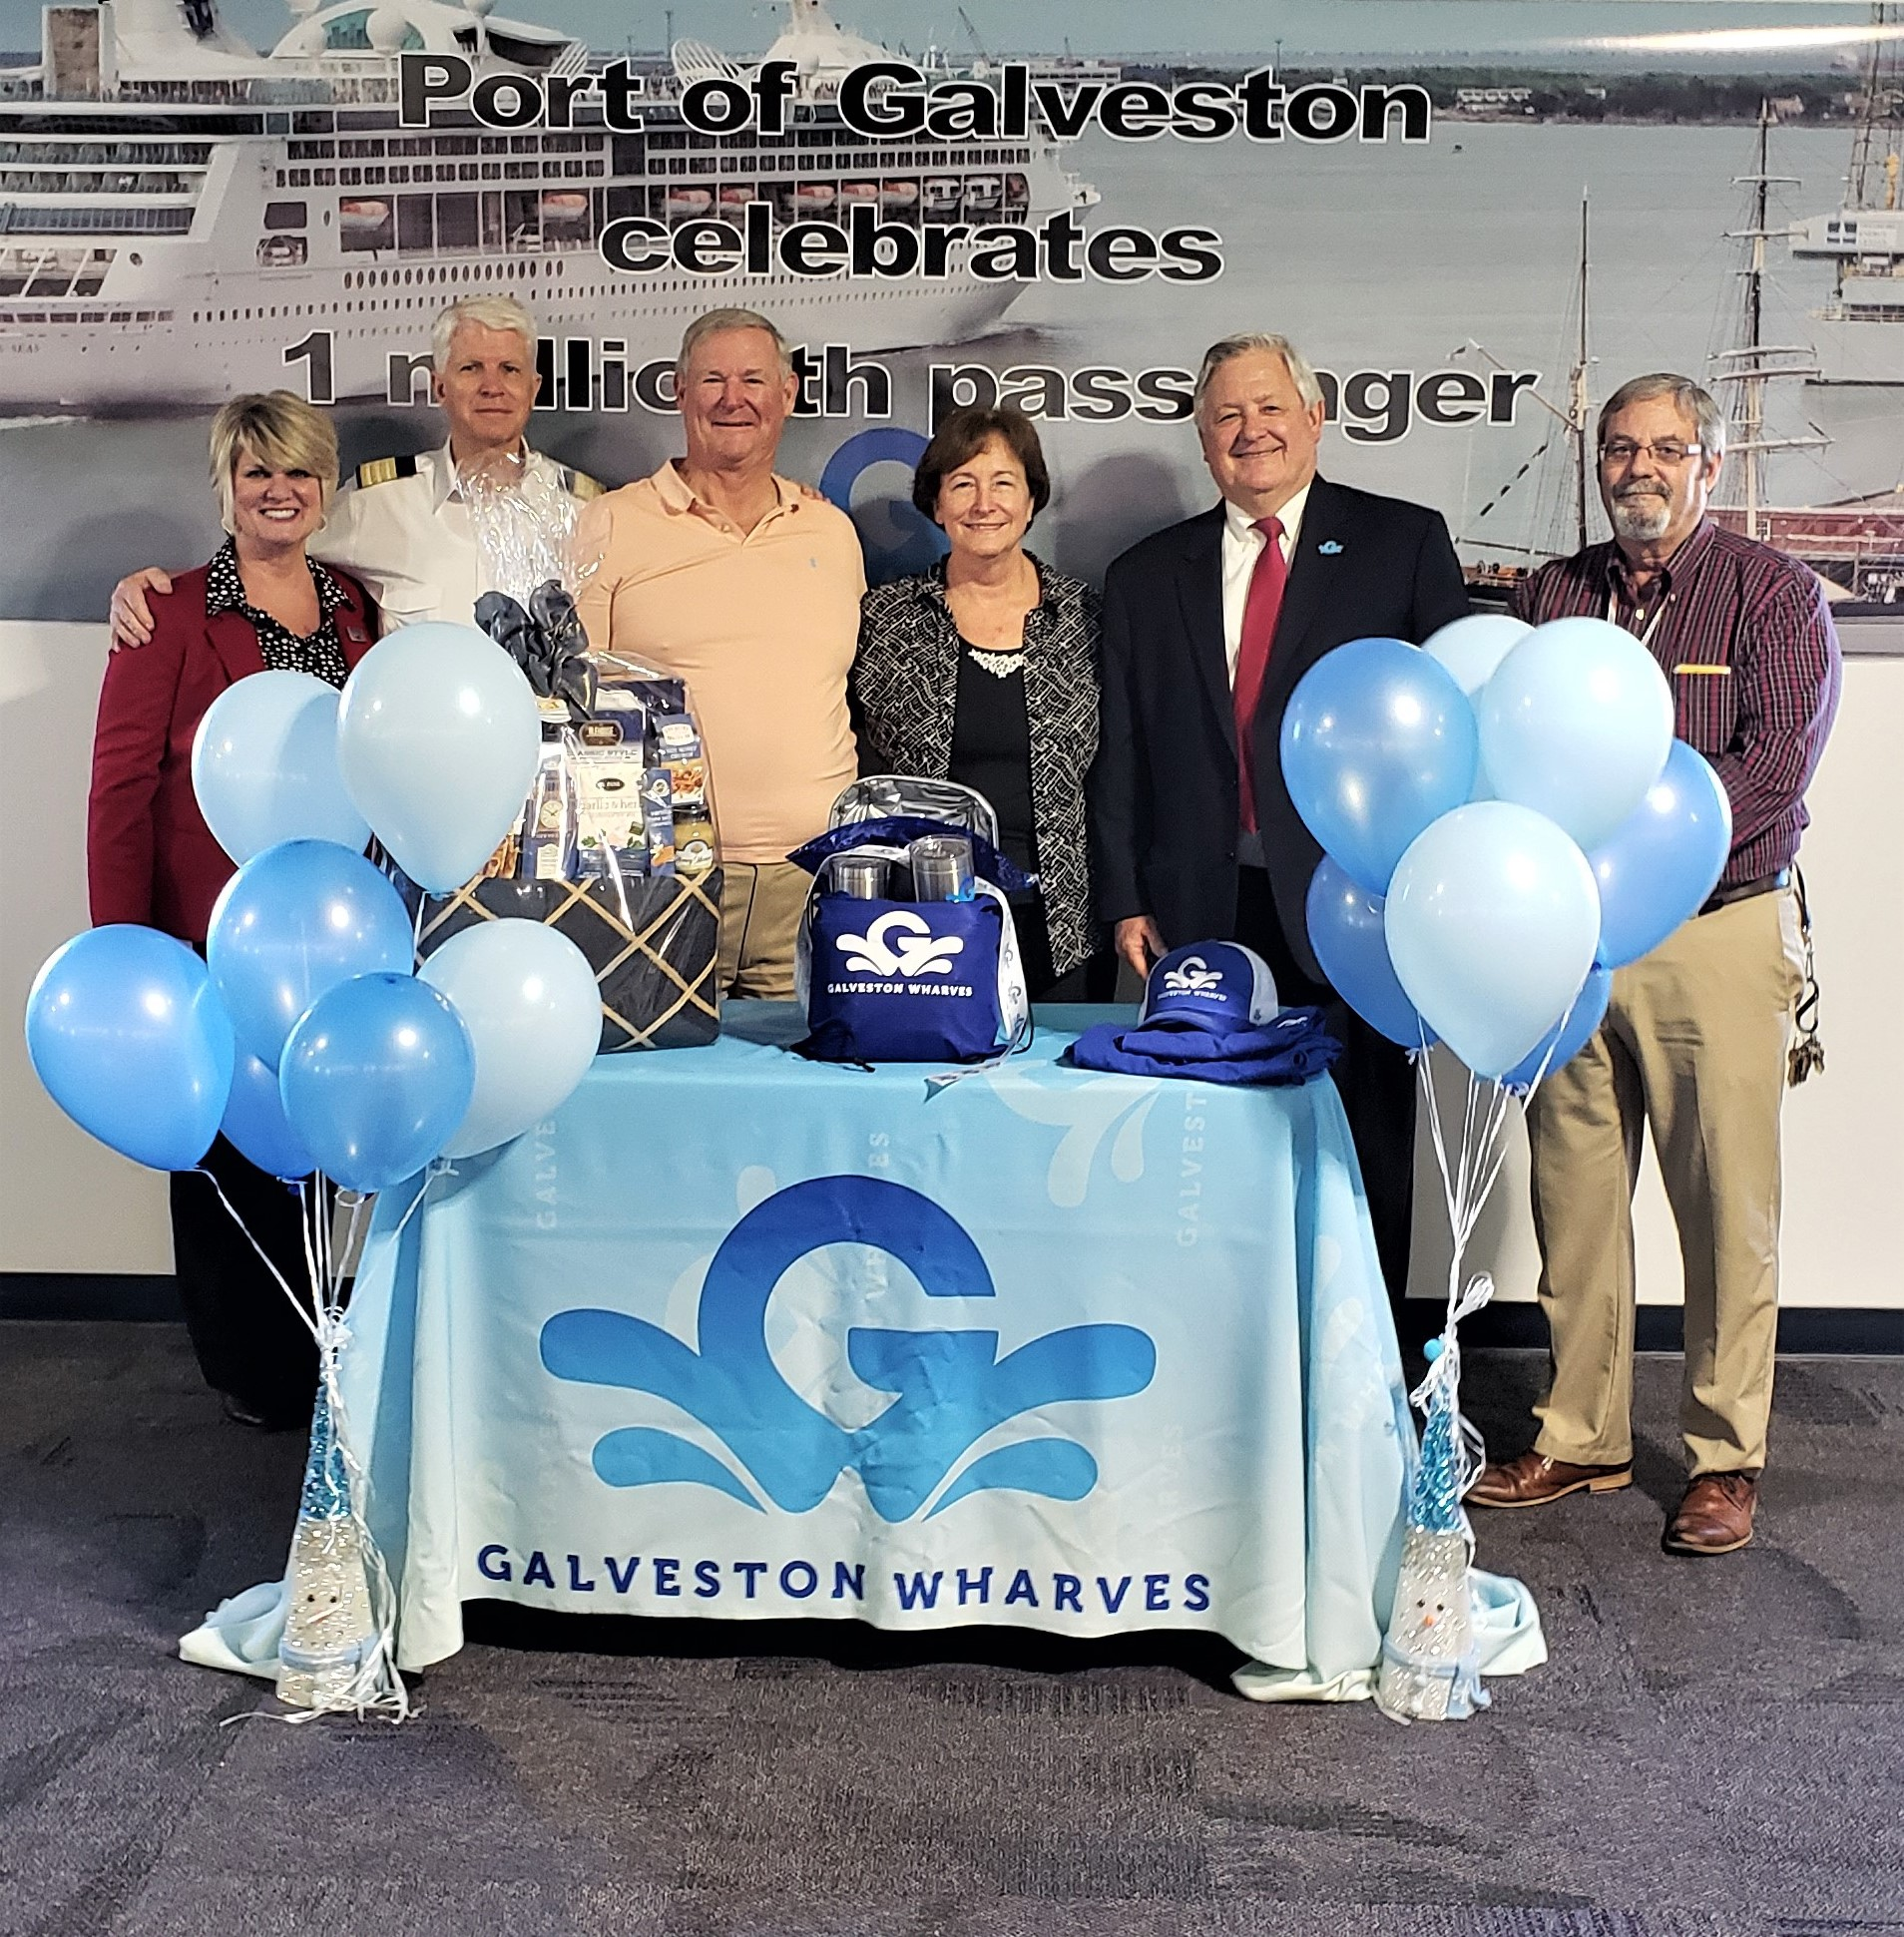 Galveston reaches new cruise milestone: 1 million passengers